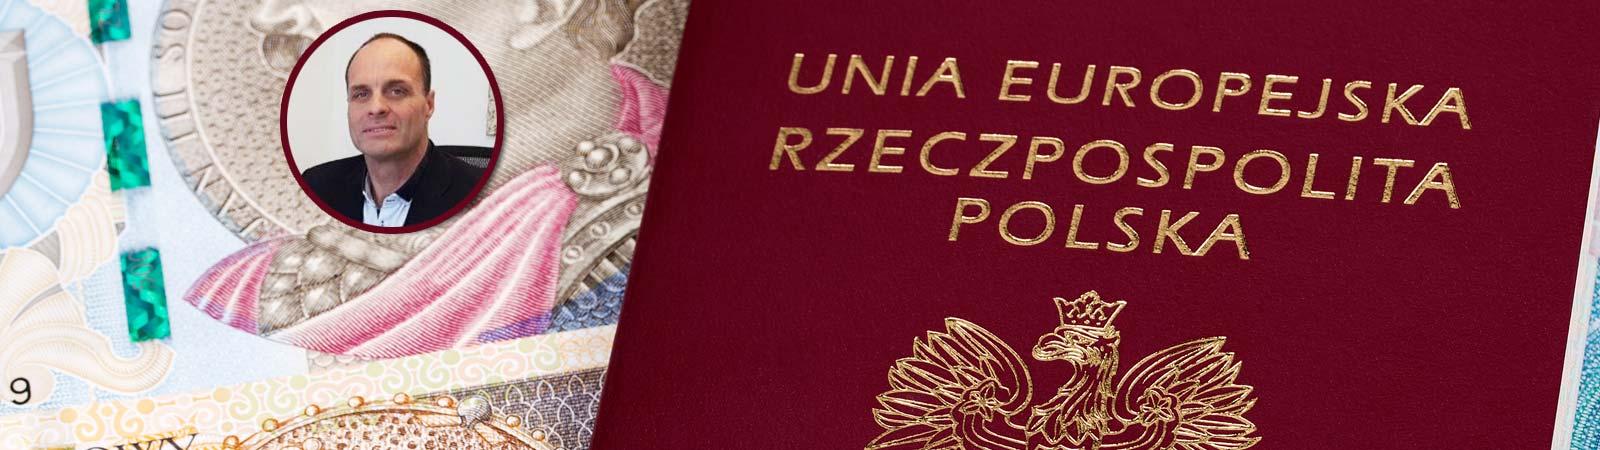 דרכון פולני - עורך דין עמיחי זילברברג